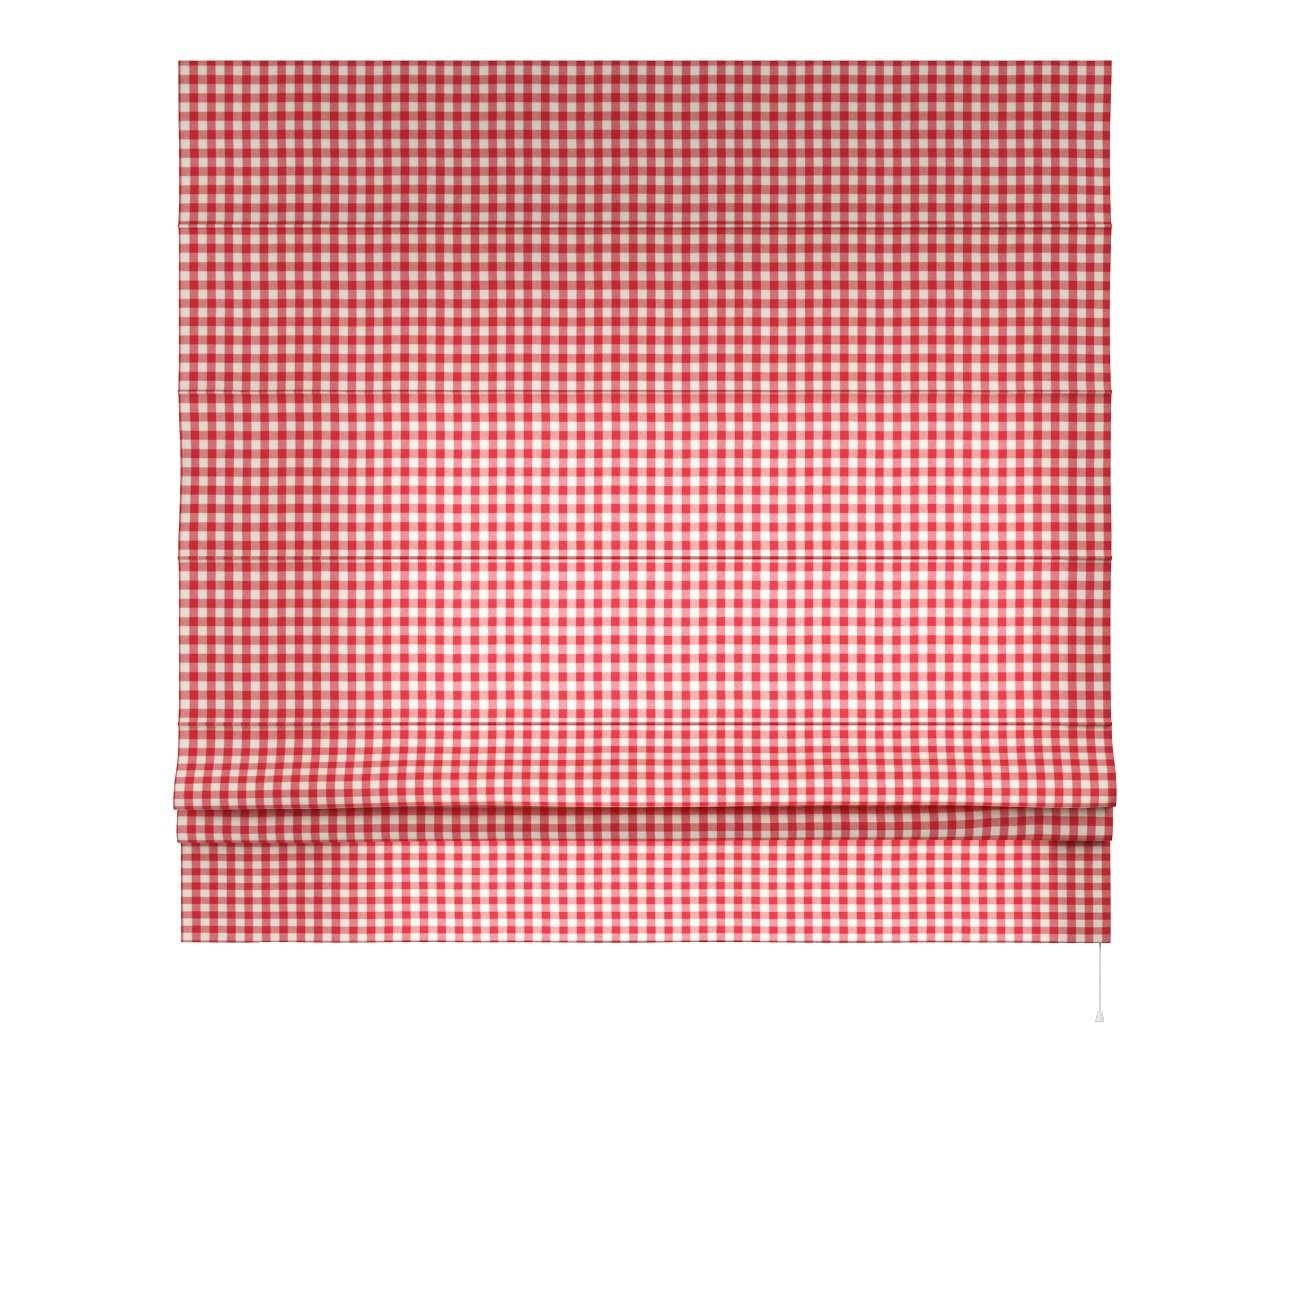 Romanetės Padva 80 x 170 cm (plotis x ilgis) kolekcijoje Quadro, audinys: 136-16